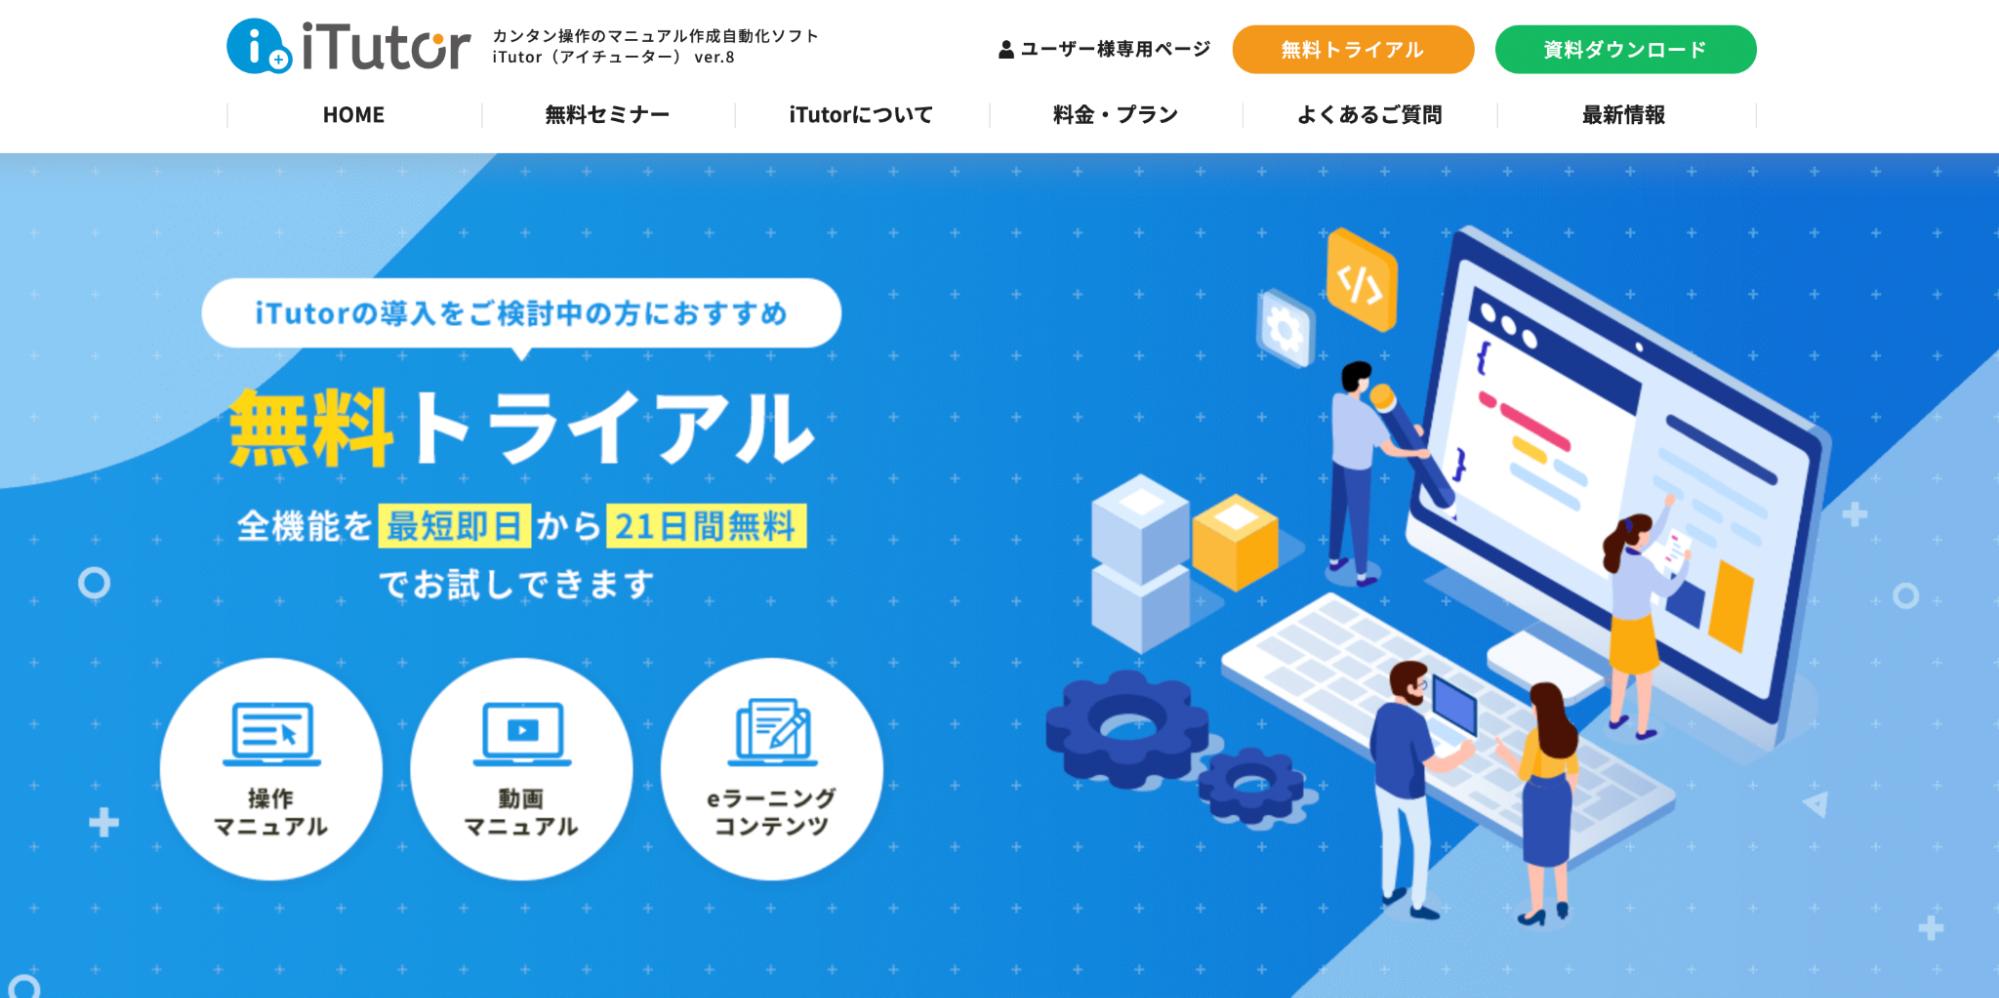 iTutorのWebサイトトップ画面